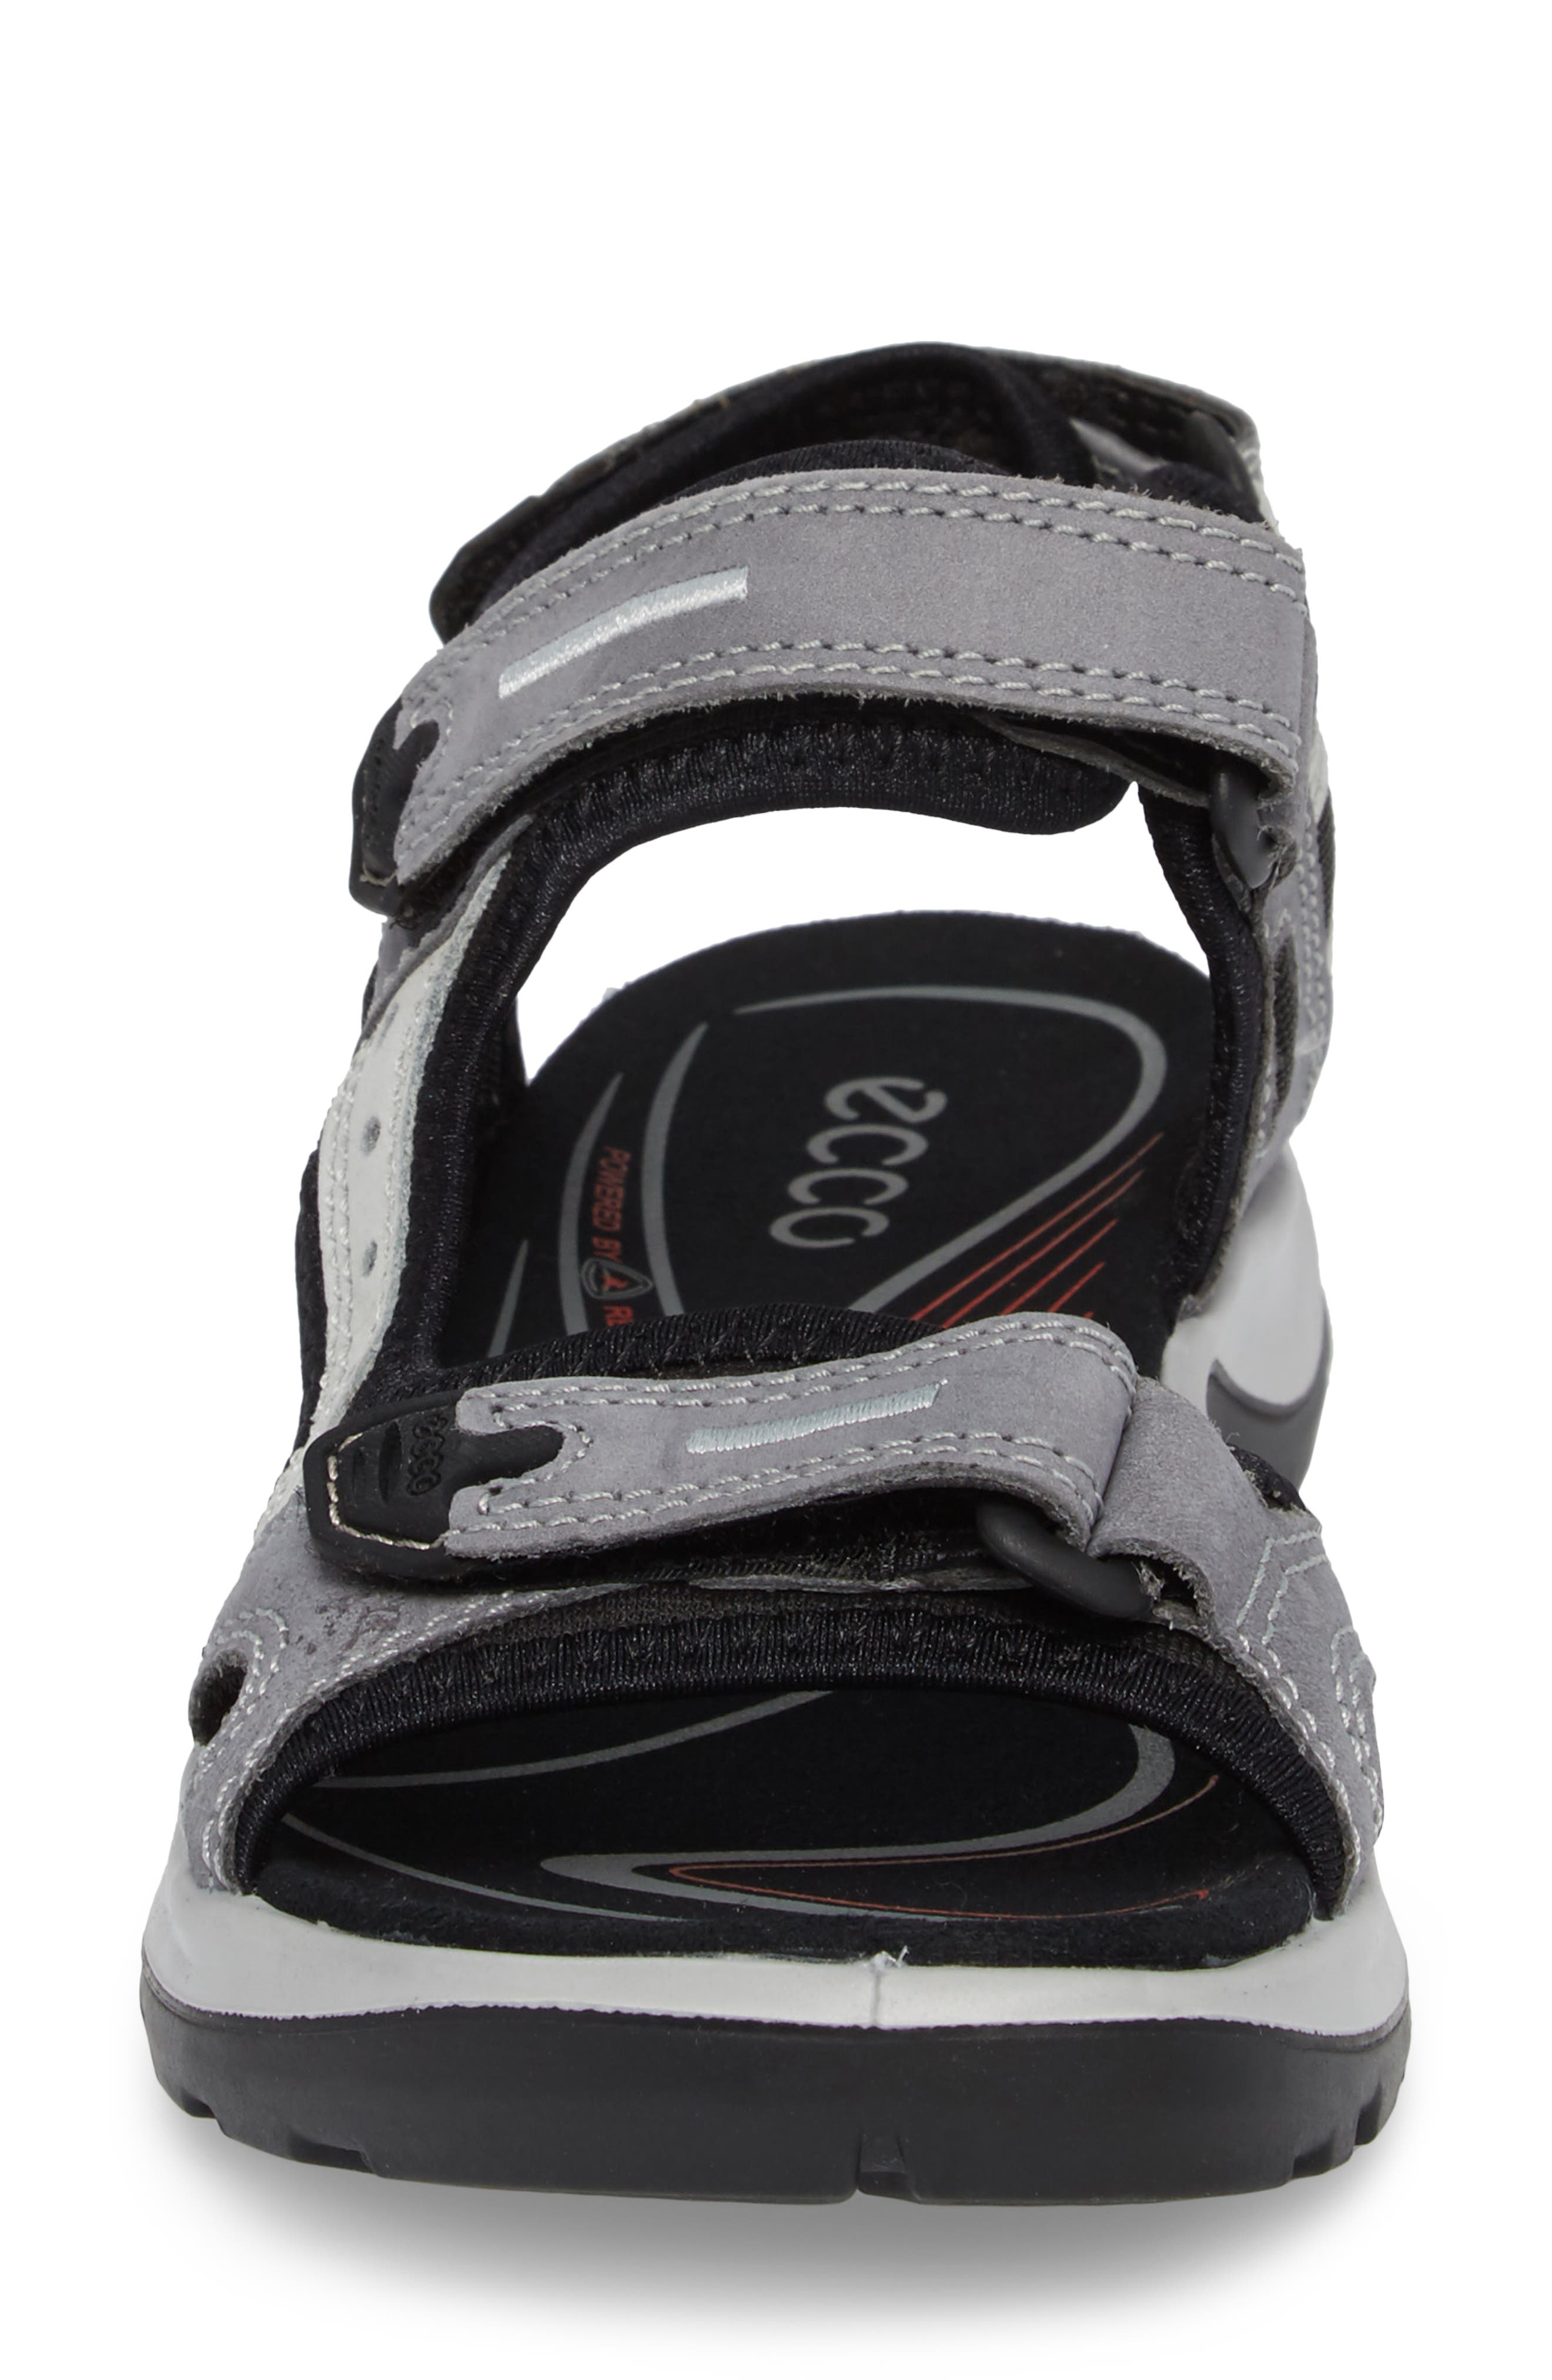 Yucatan Sandal,                             Alternate thumbnail 4, color,                             Titanium Leather